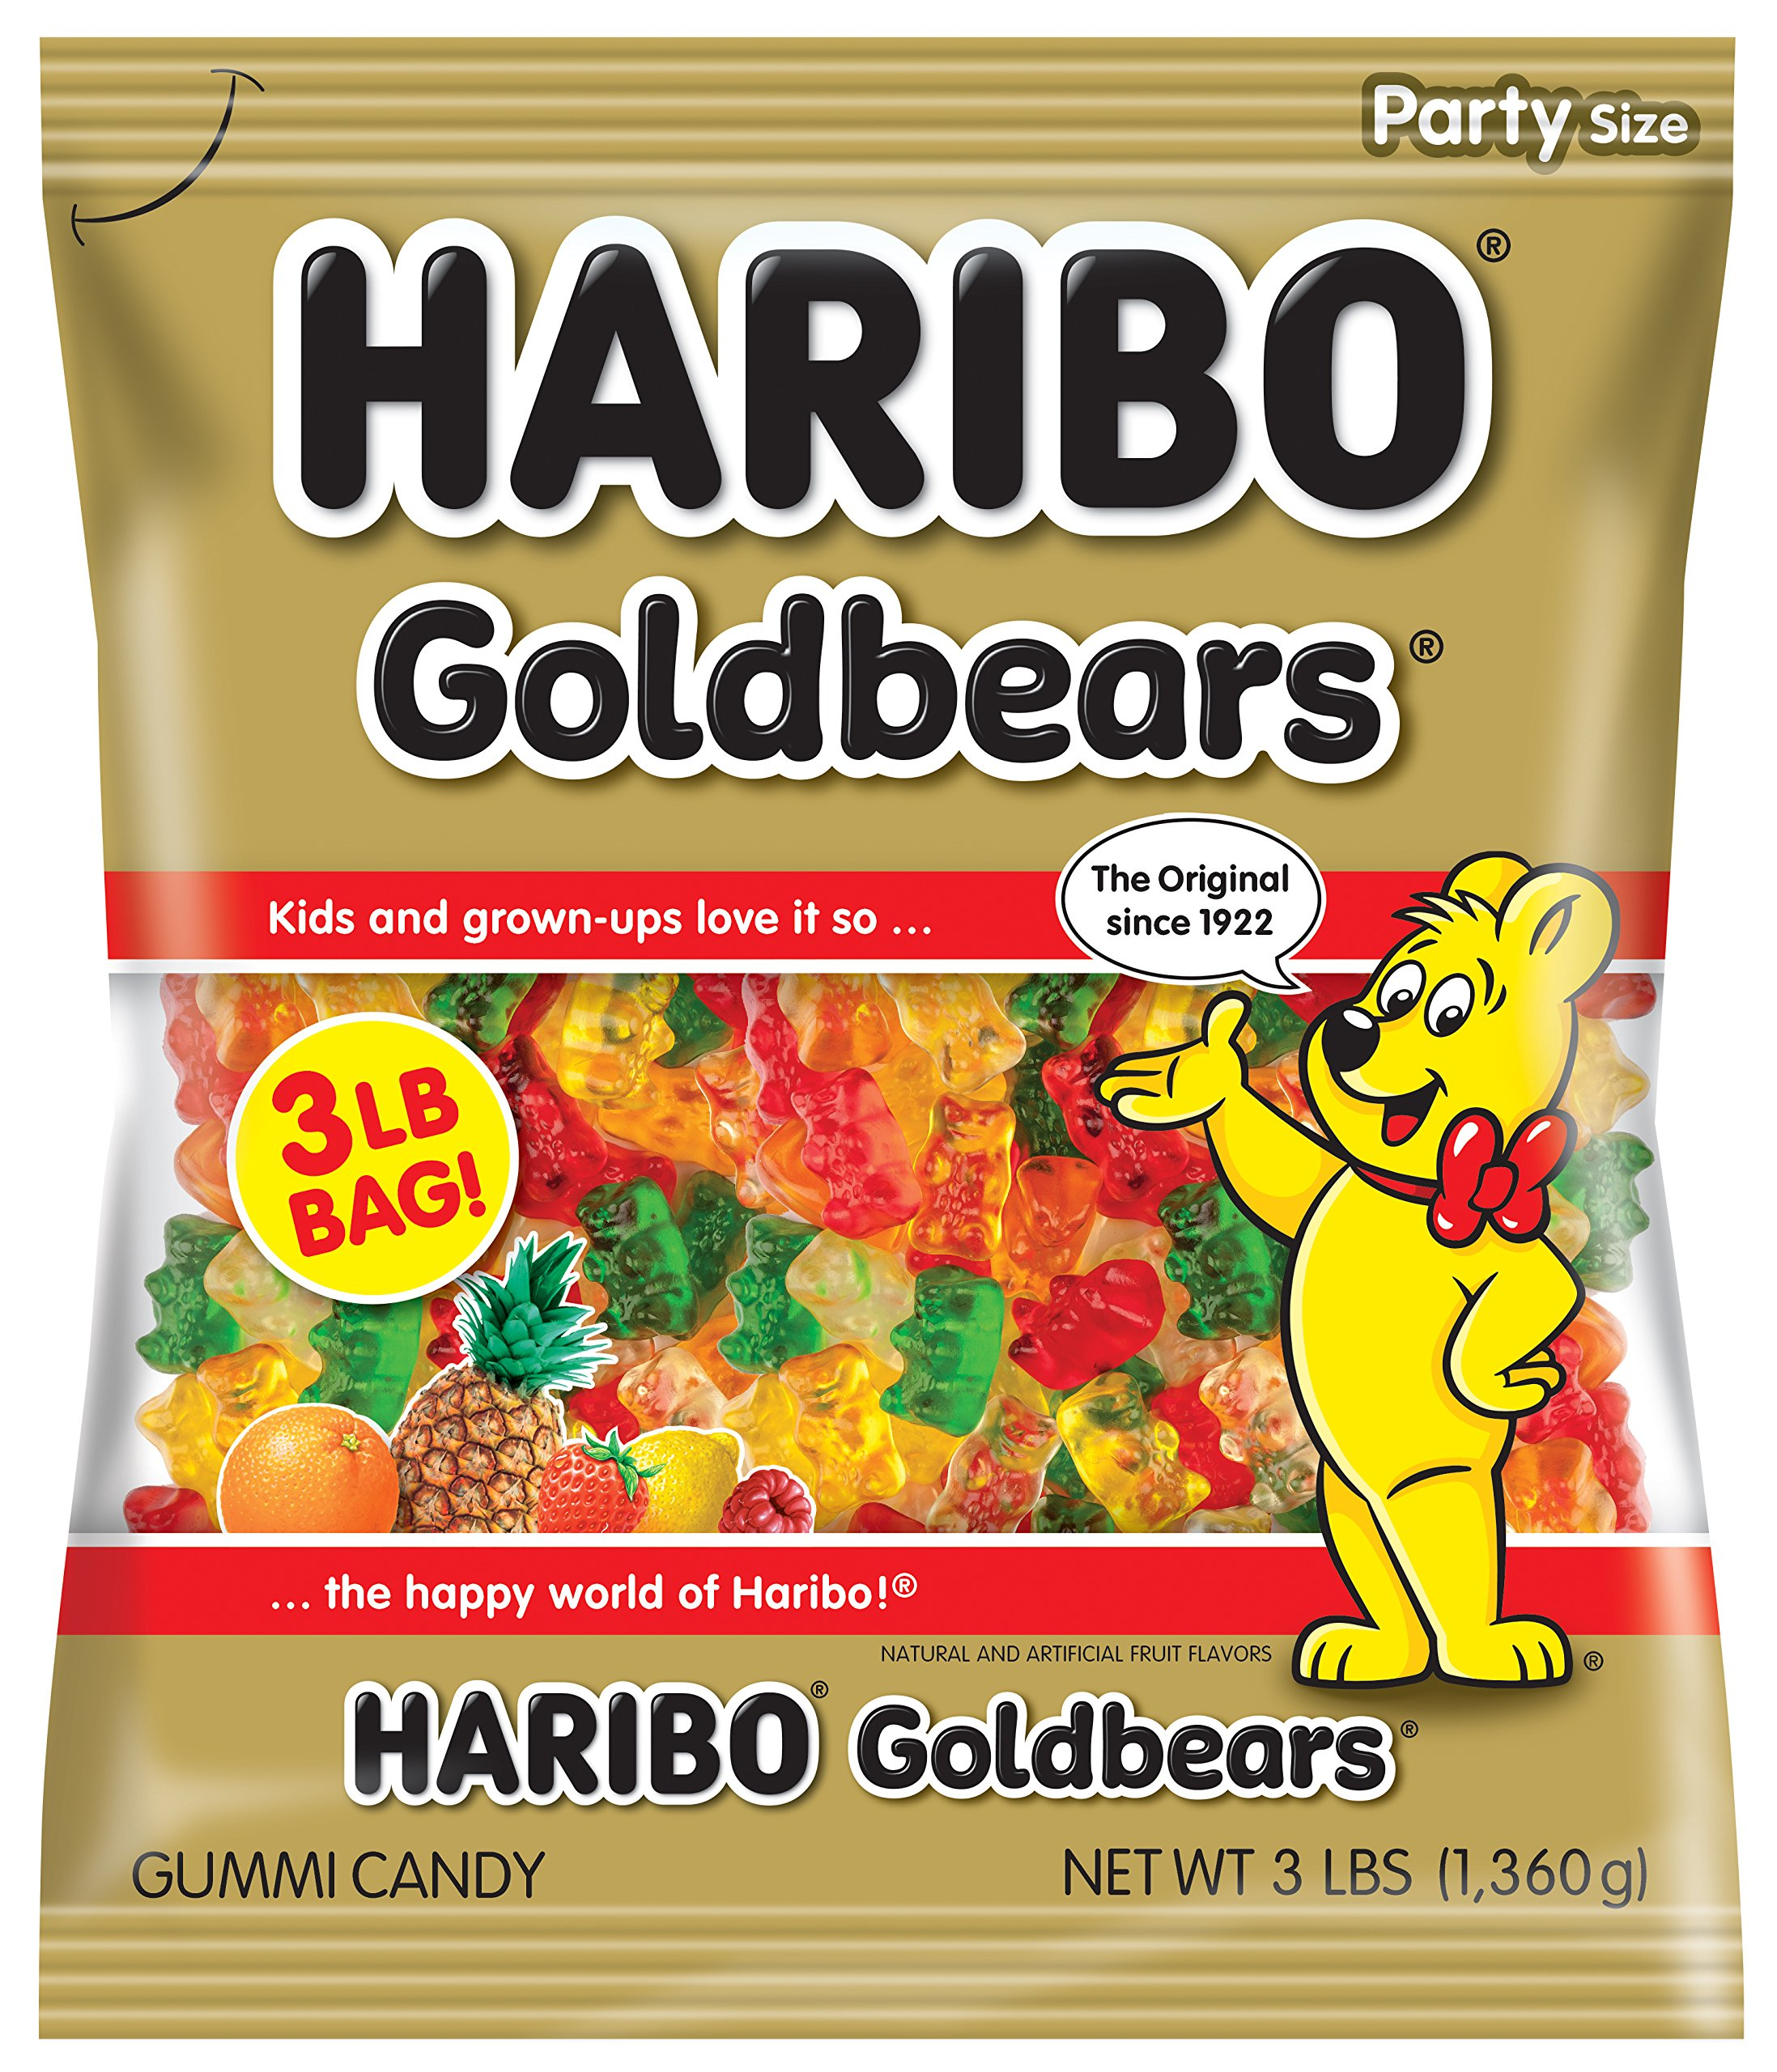 Haribo Gummi Candy, Goldbears Gummy Candy, 48 Ounce (Pack of 4)